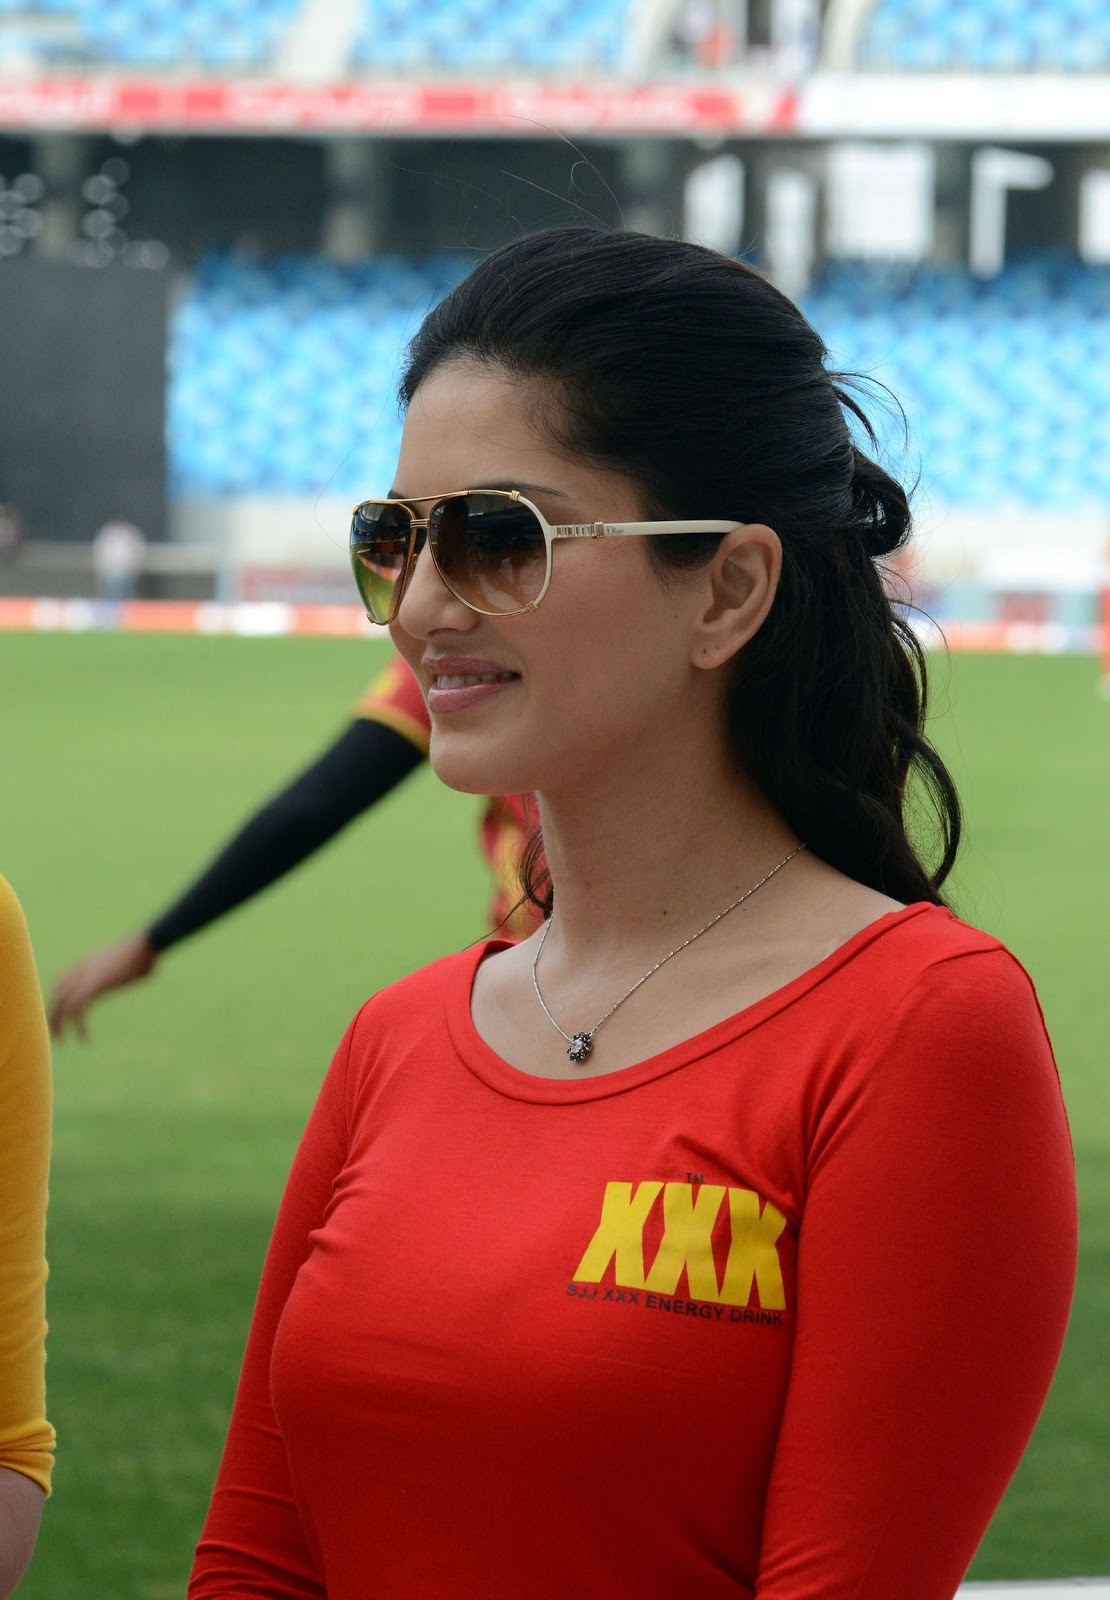 Porn Star Sunny Leone Wear Xxx Shirt During Ccl Match  Webenty-4520